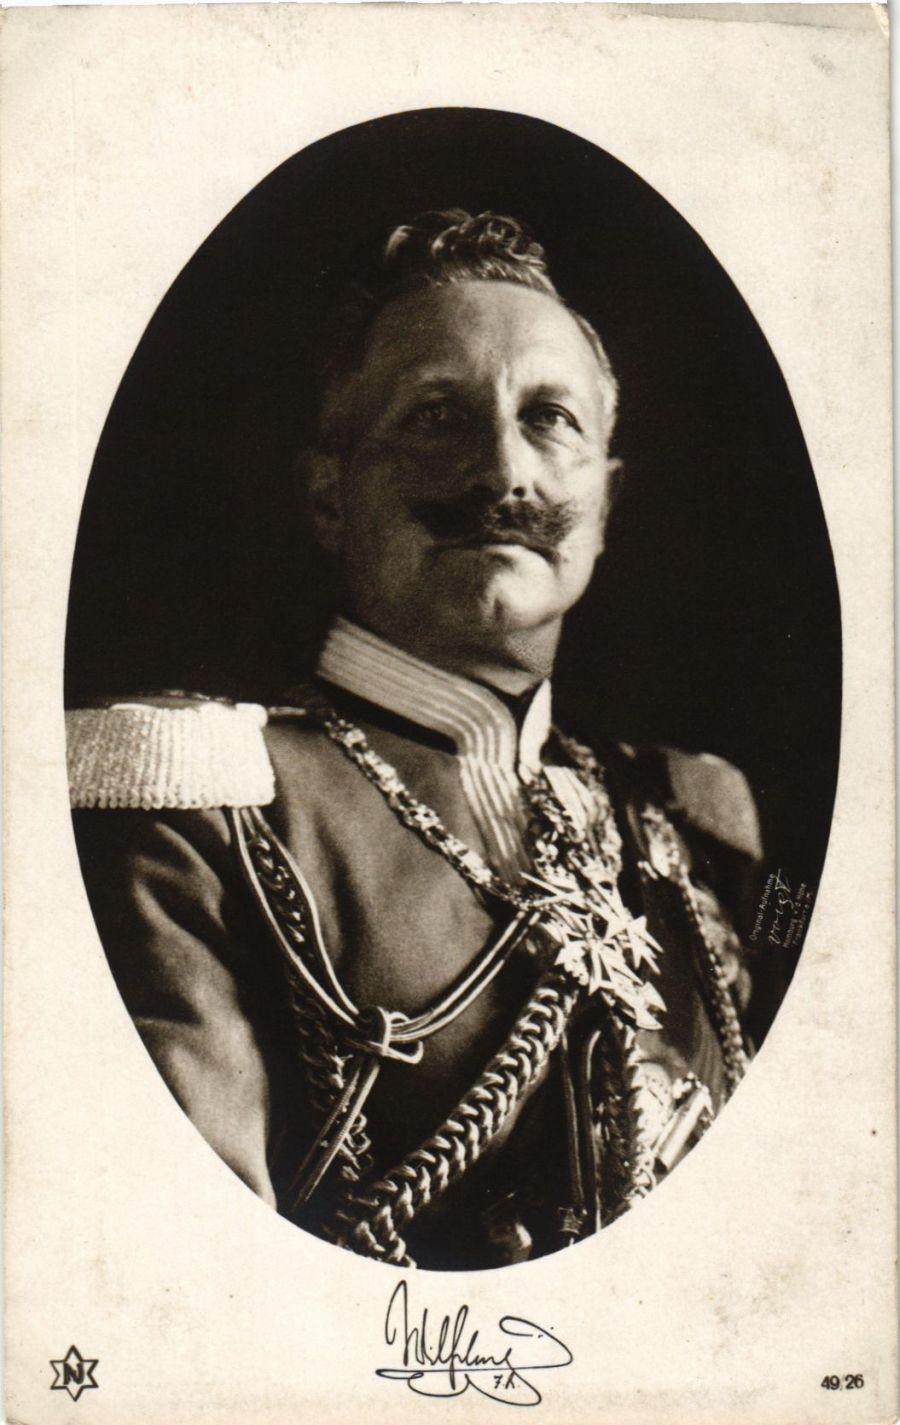 CPA-AK-Kaiser-Wilhelm-II-GERMAN-ROYALTY-867497